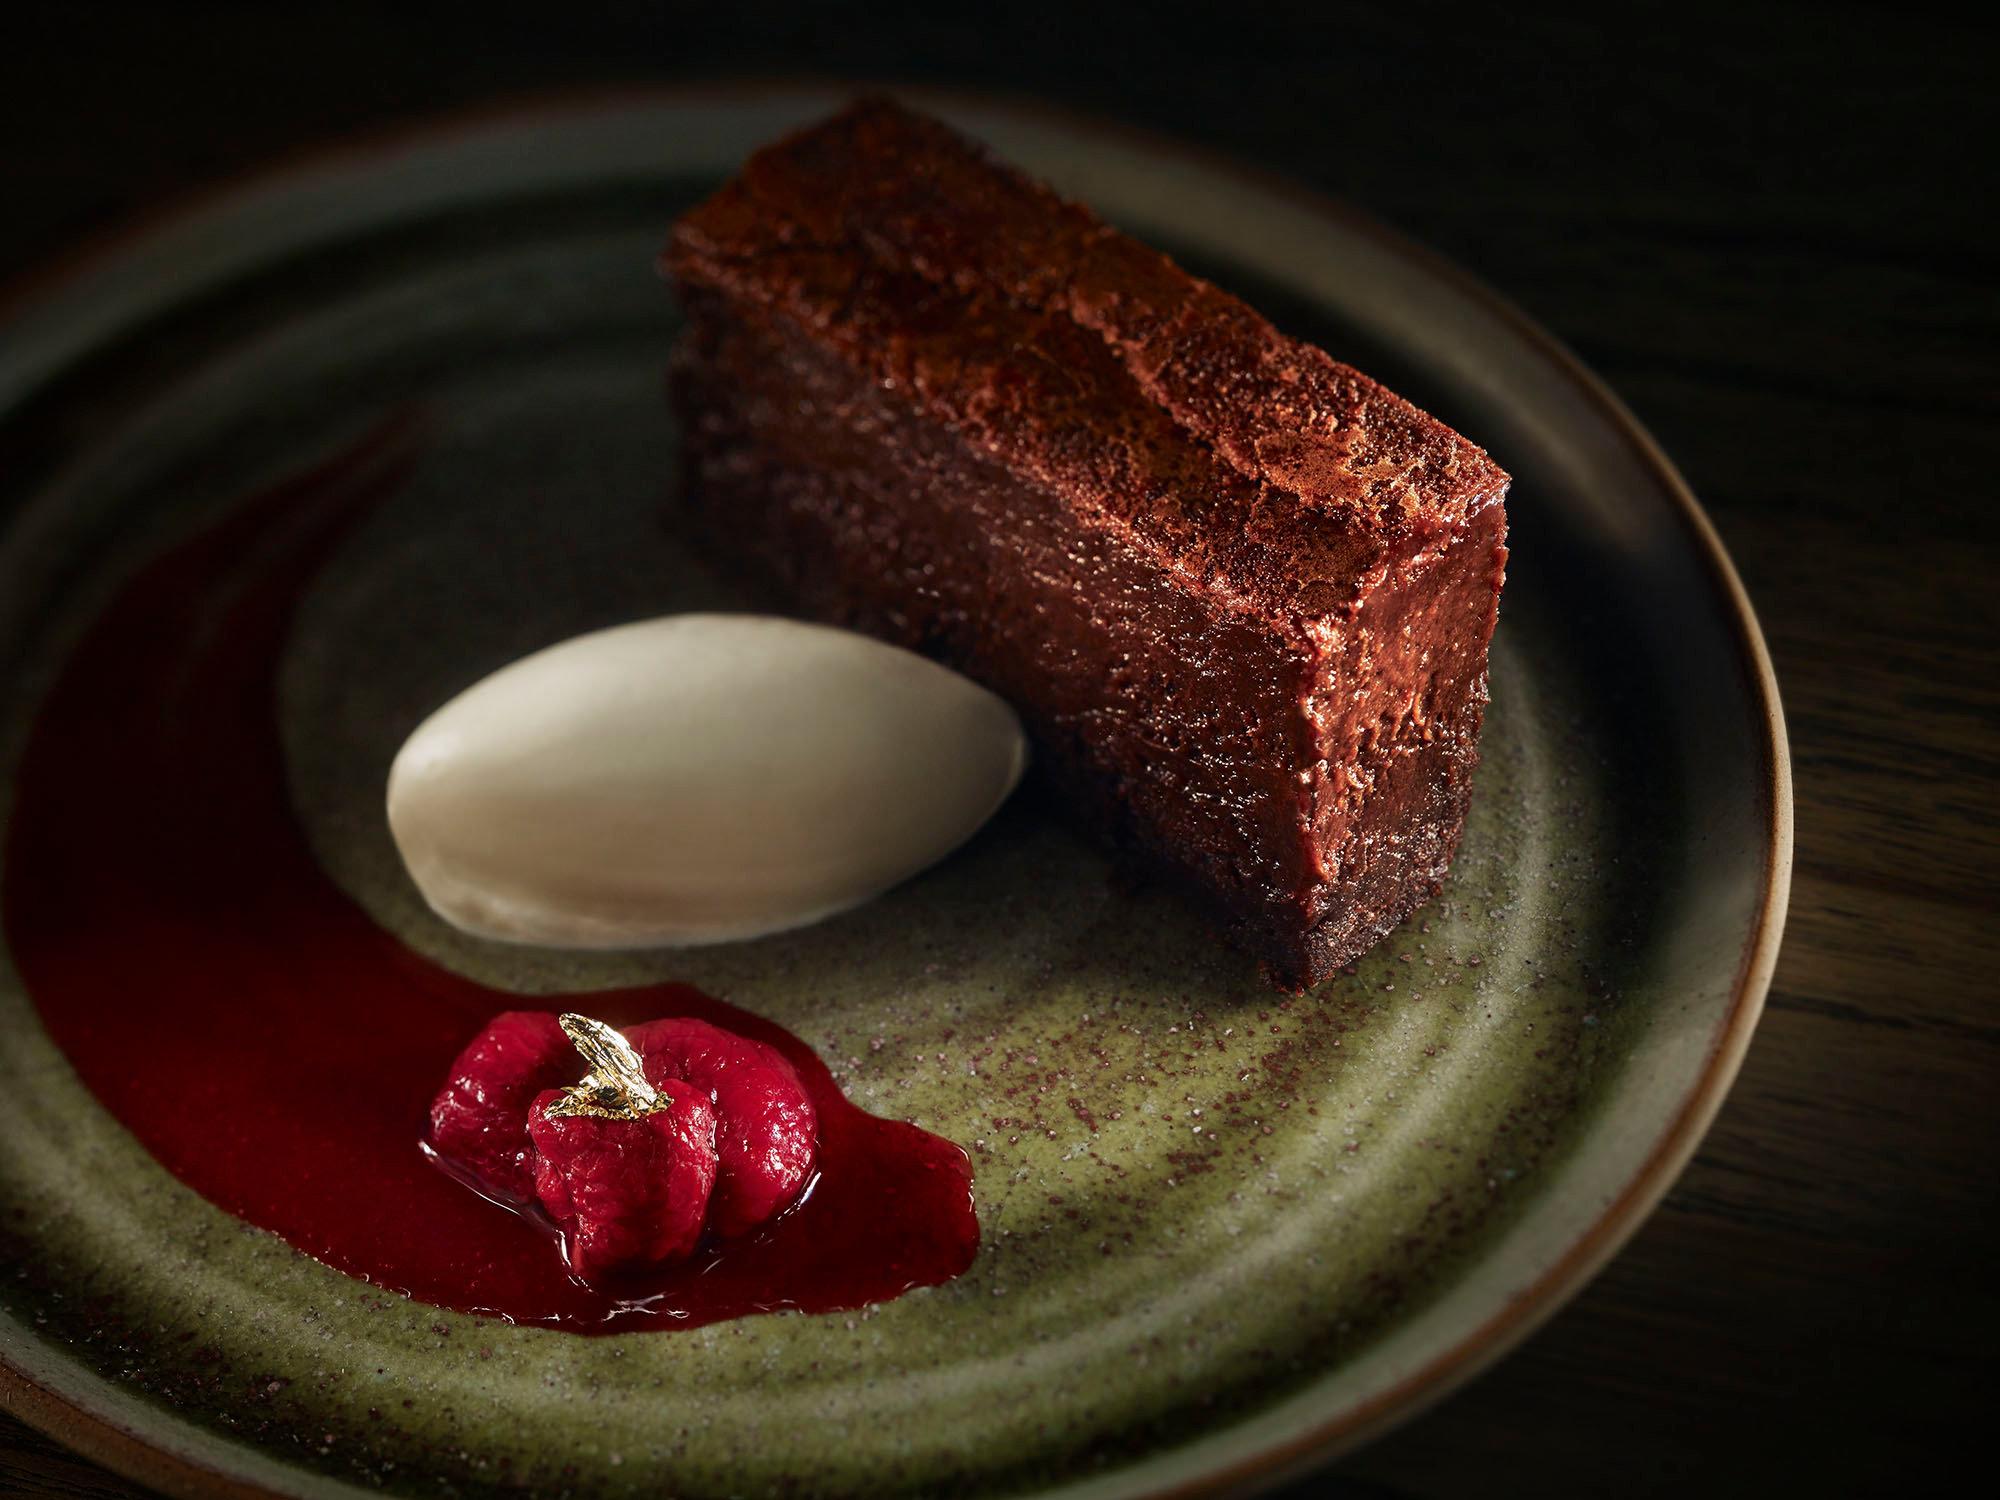 Dessert-brownie.jpg